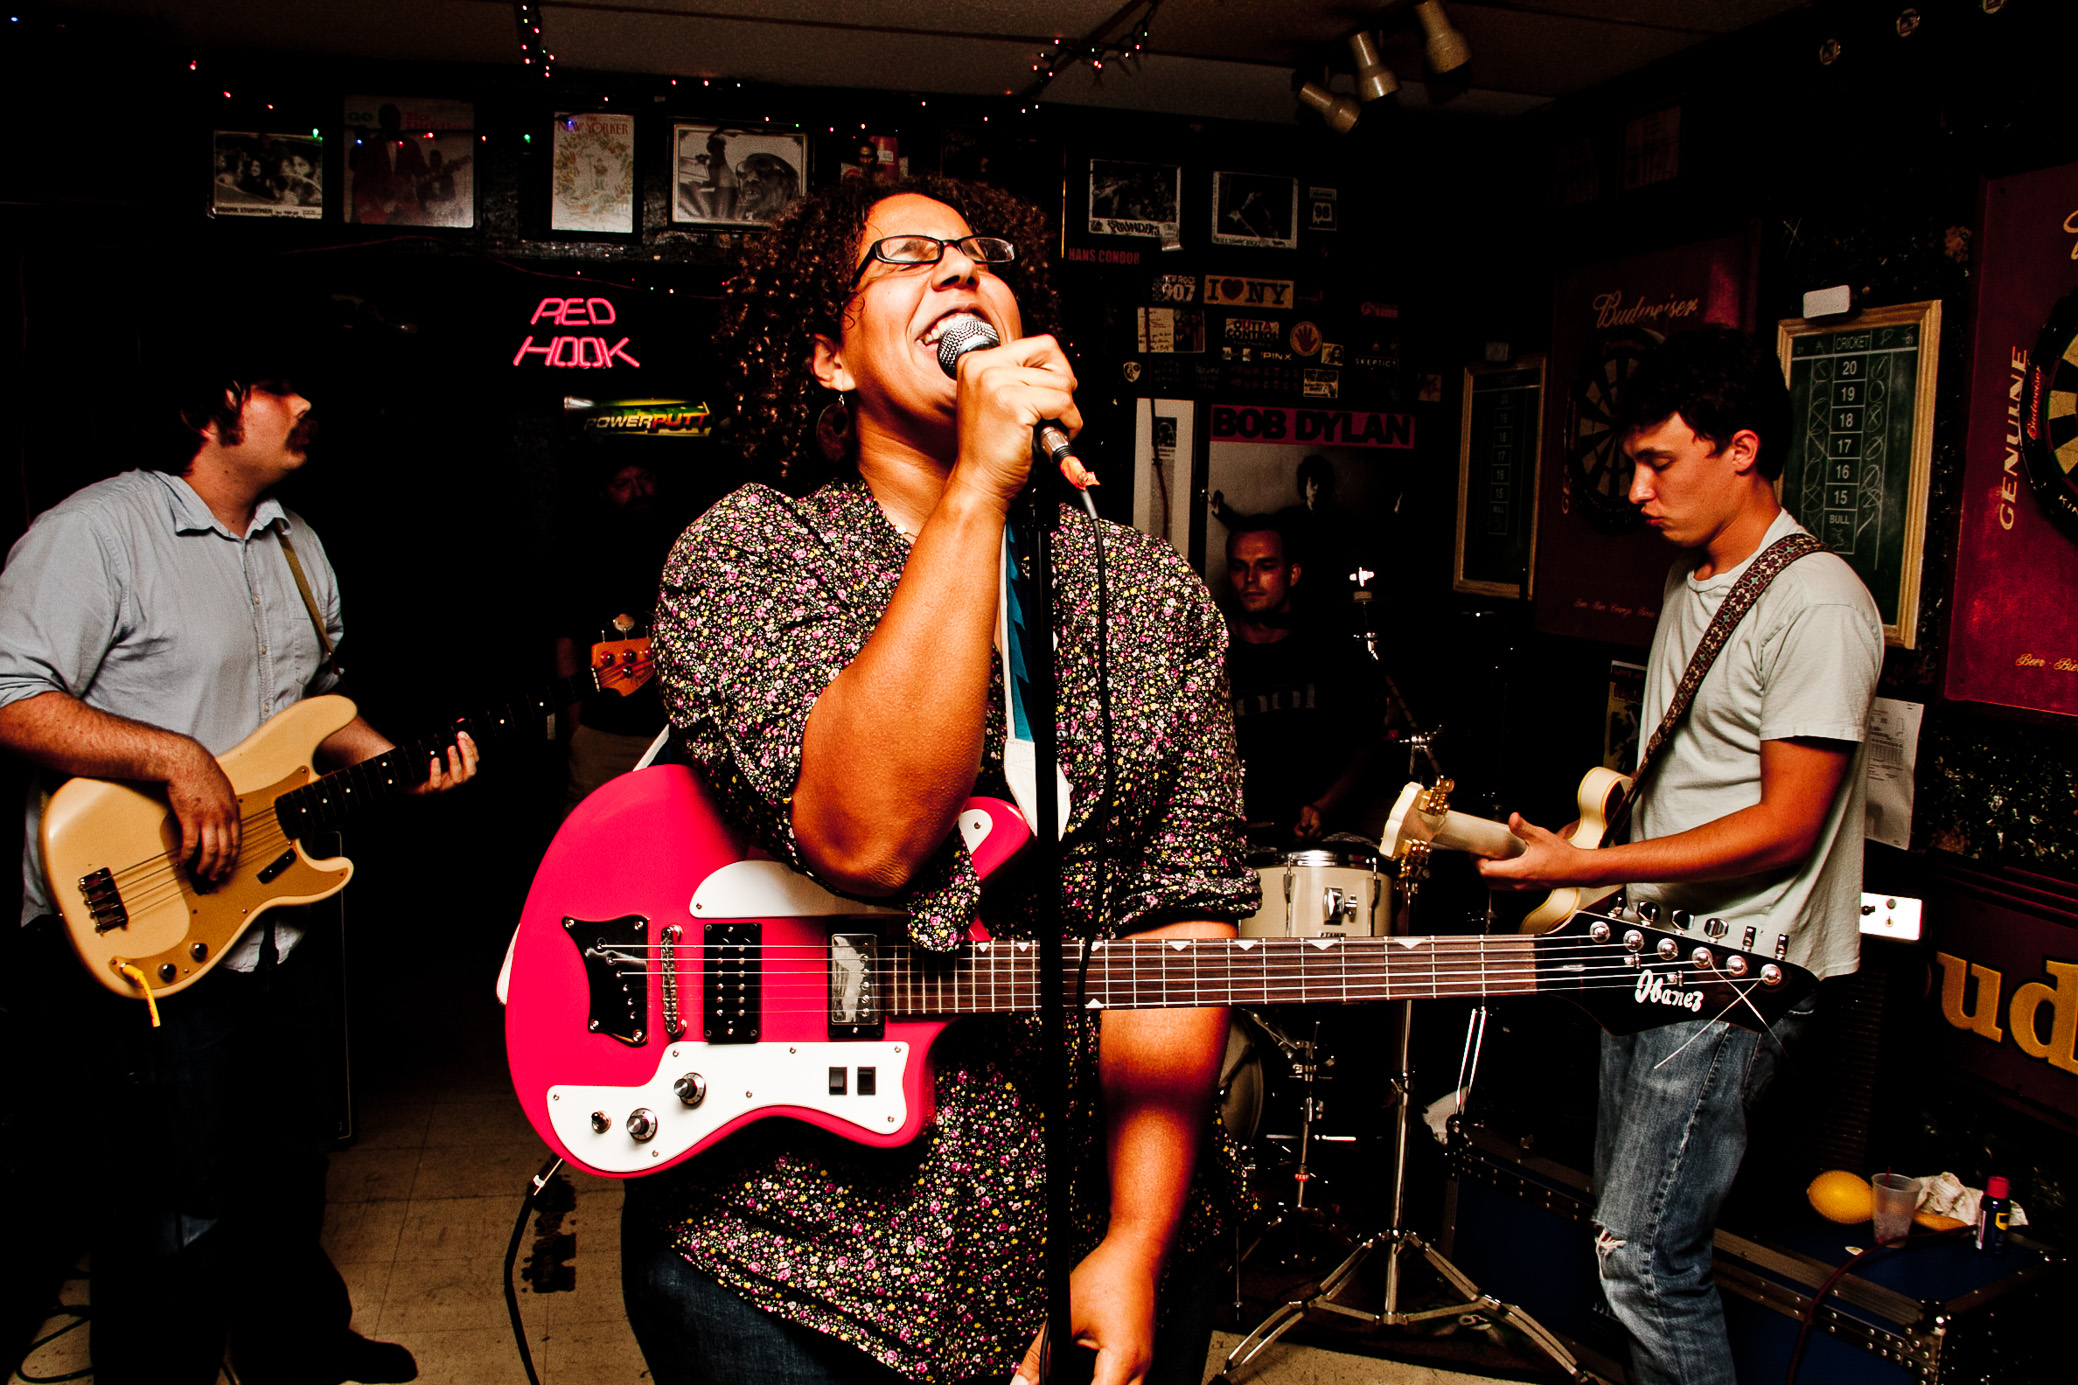 Alabama Shakes perform at Egan's Bar in Tuscaloosa, Alabama on July 10th, 2010. (Photo by David A. Smith/DSmithScenes)